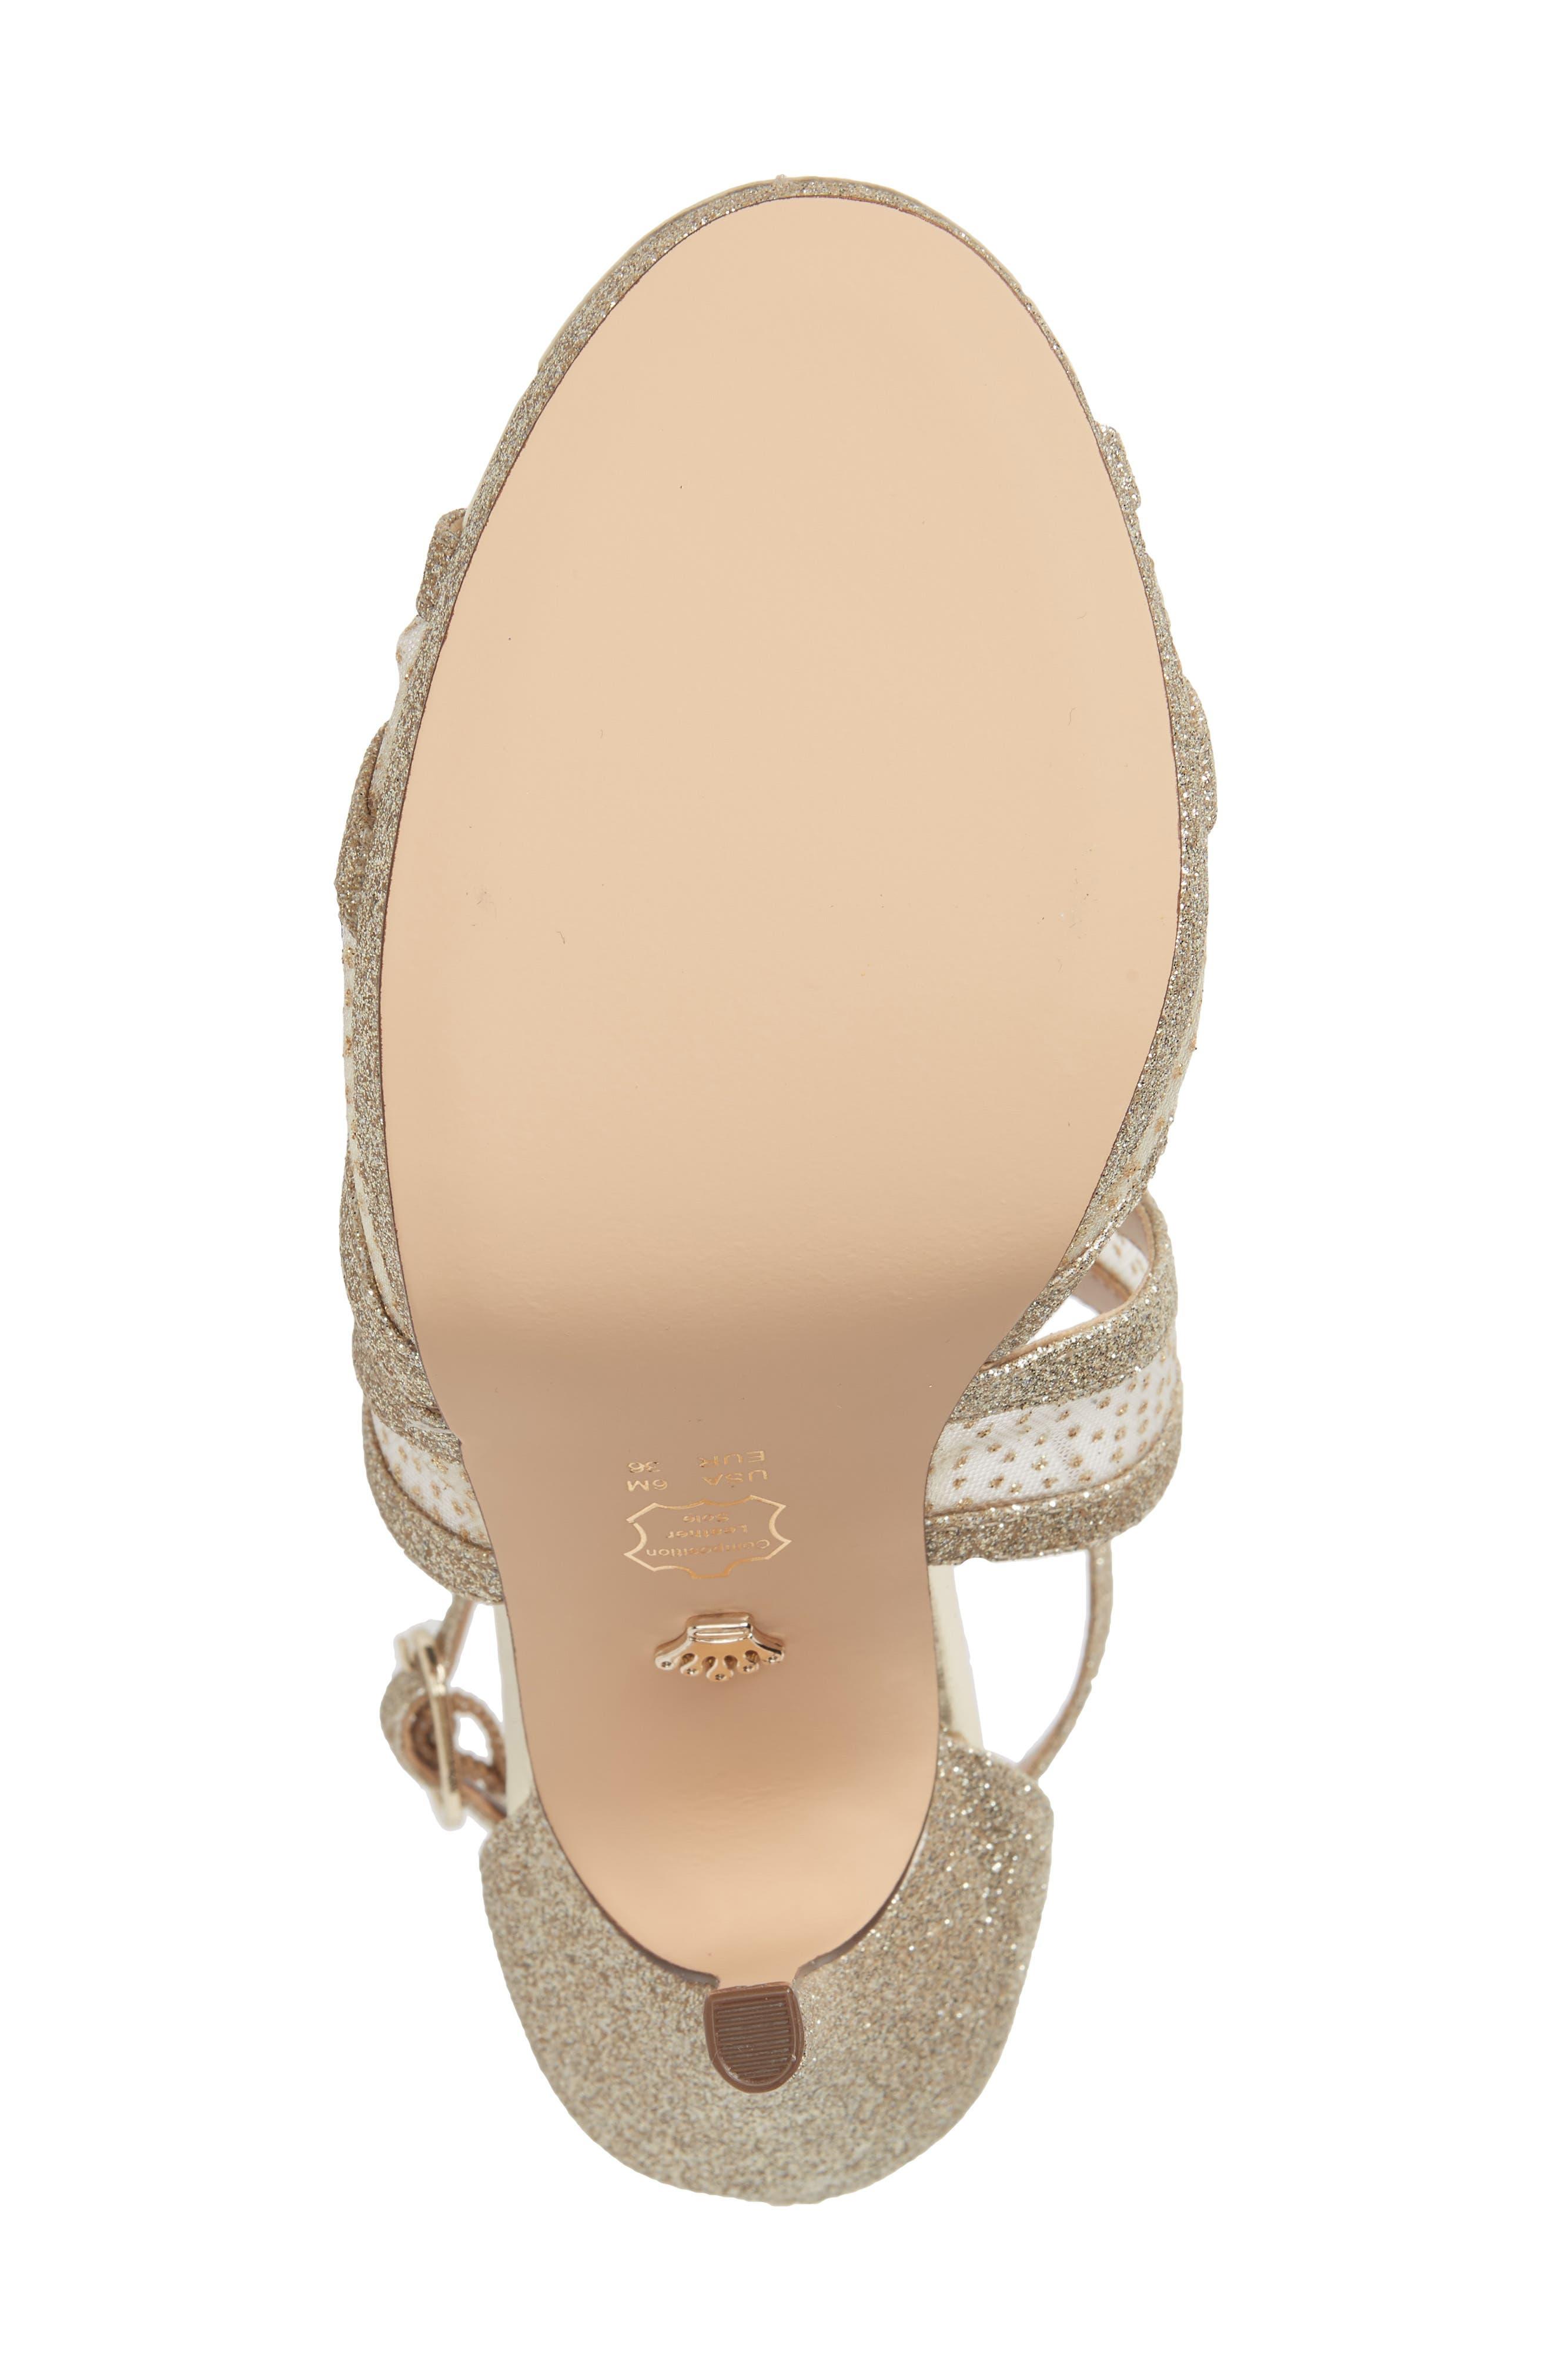 NINA, Fenna Strappy Platform Sandal, Alternate thumbnail 6, color, GOLD GLITTER FABRIC